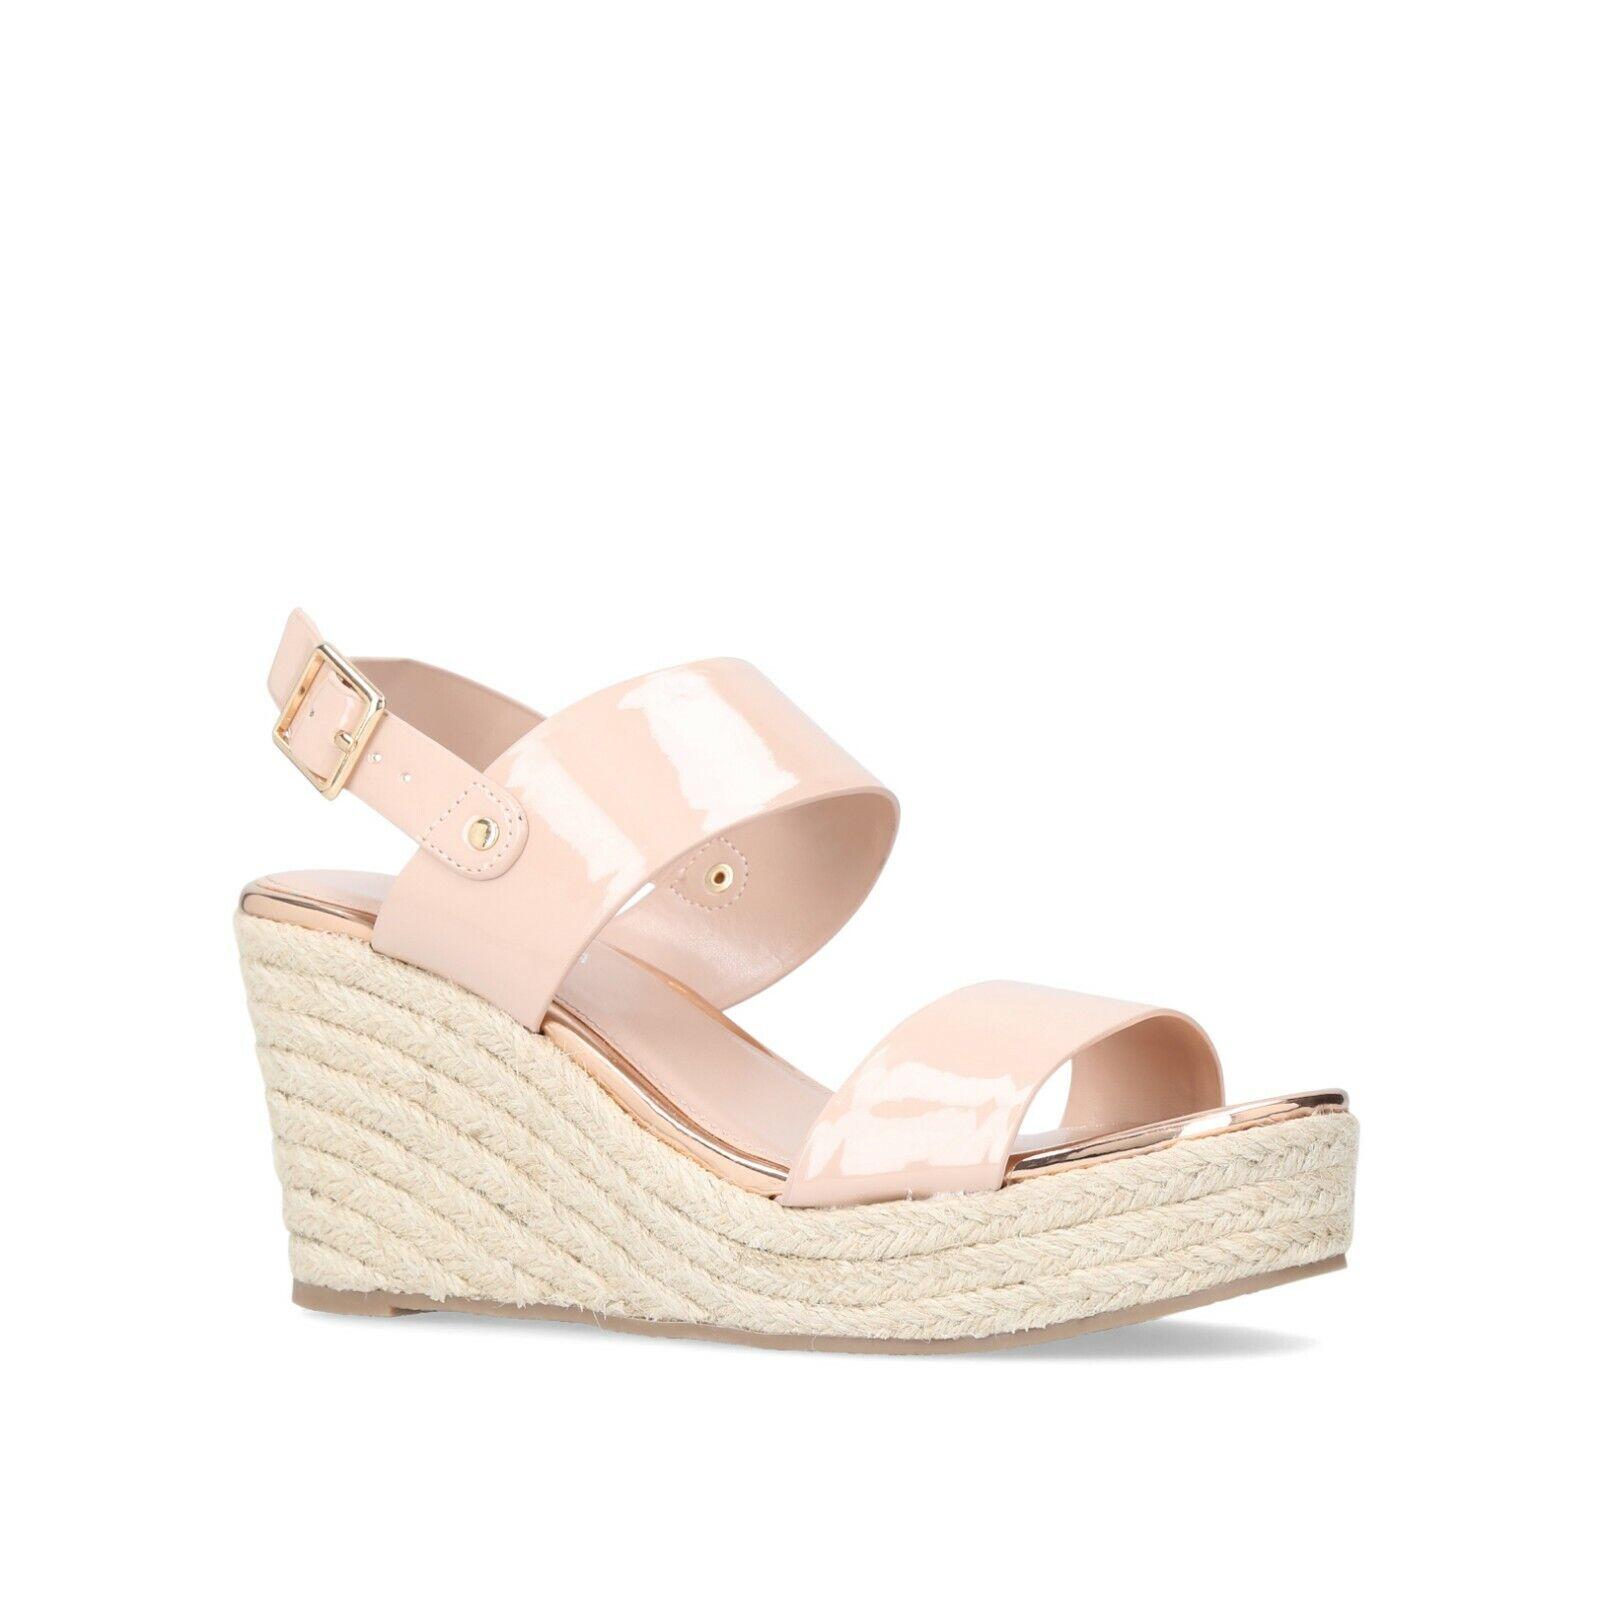 BNIB Carvela Nude Patent Mid Espadrille Wedge Heel Strap Sandals shoes Sz 7 40